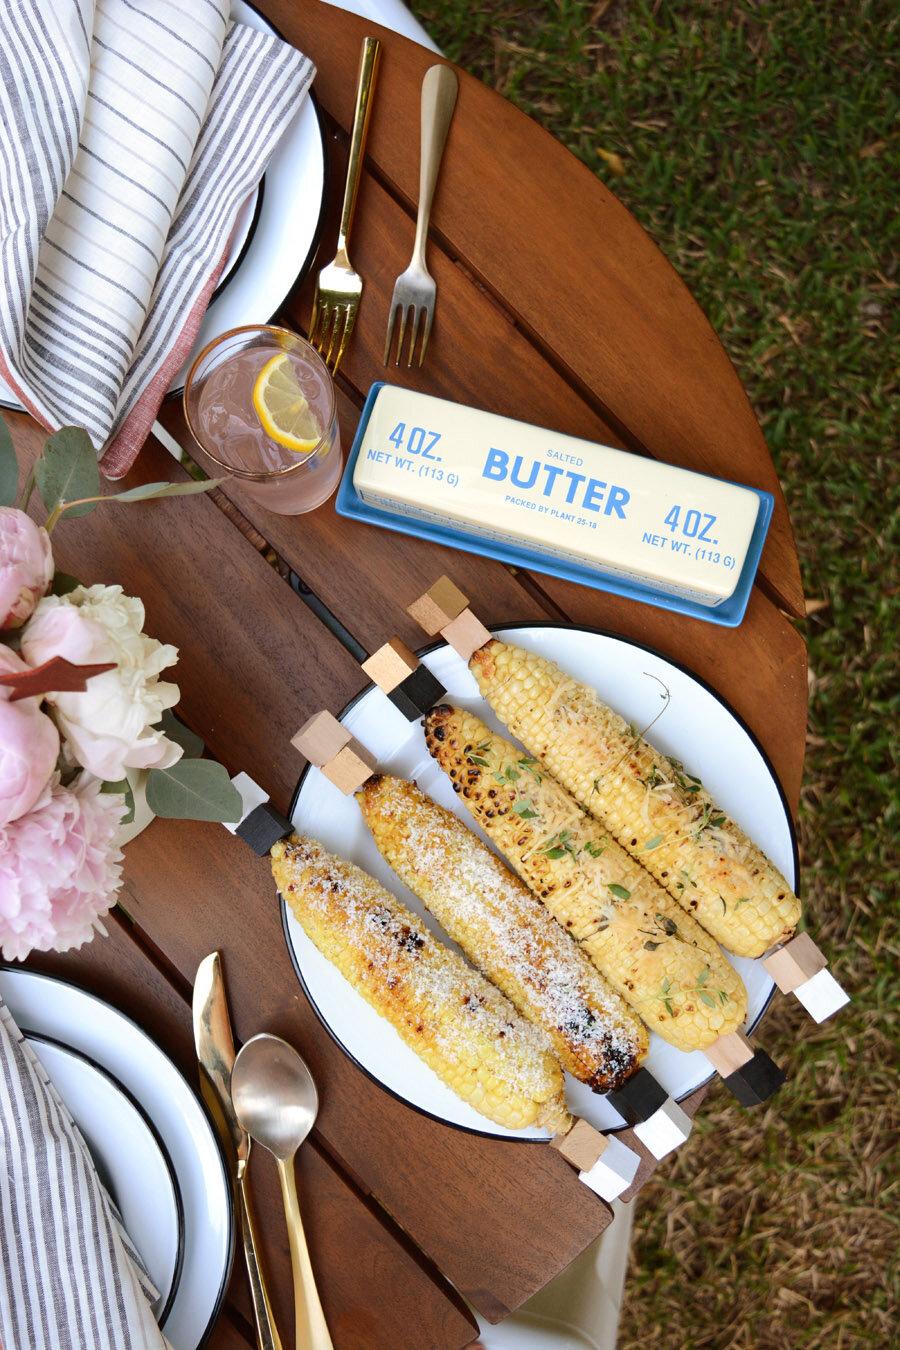 west-elm-parmesan-thyme-corn-on-the-cob-01.jpg